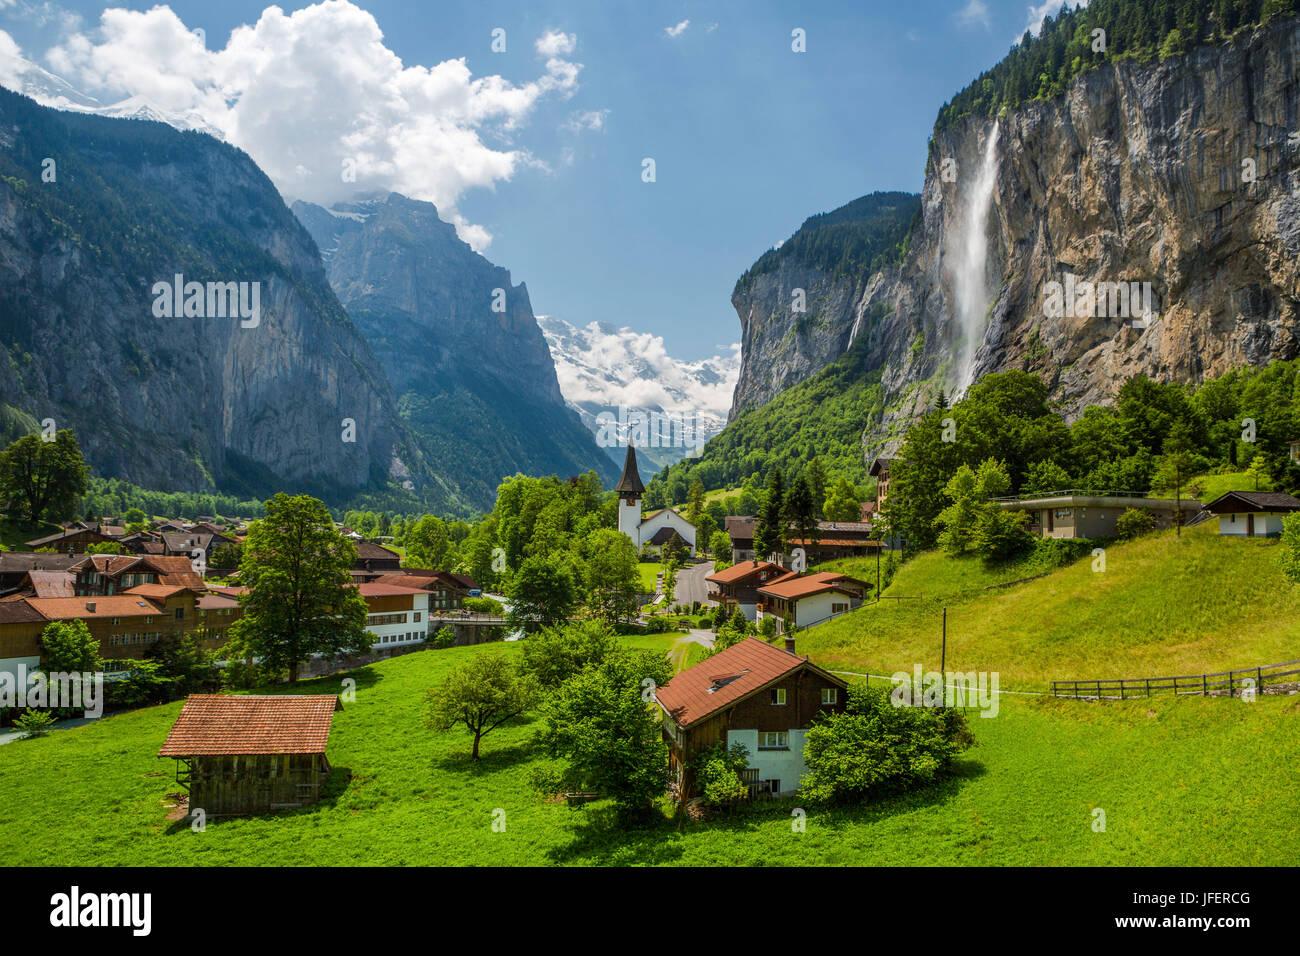 Switzerland, Lauterbrunnen City, Jungfrau Mountain - Stock Image